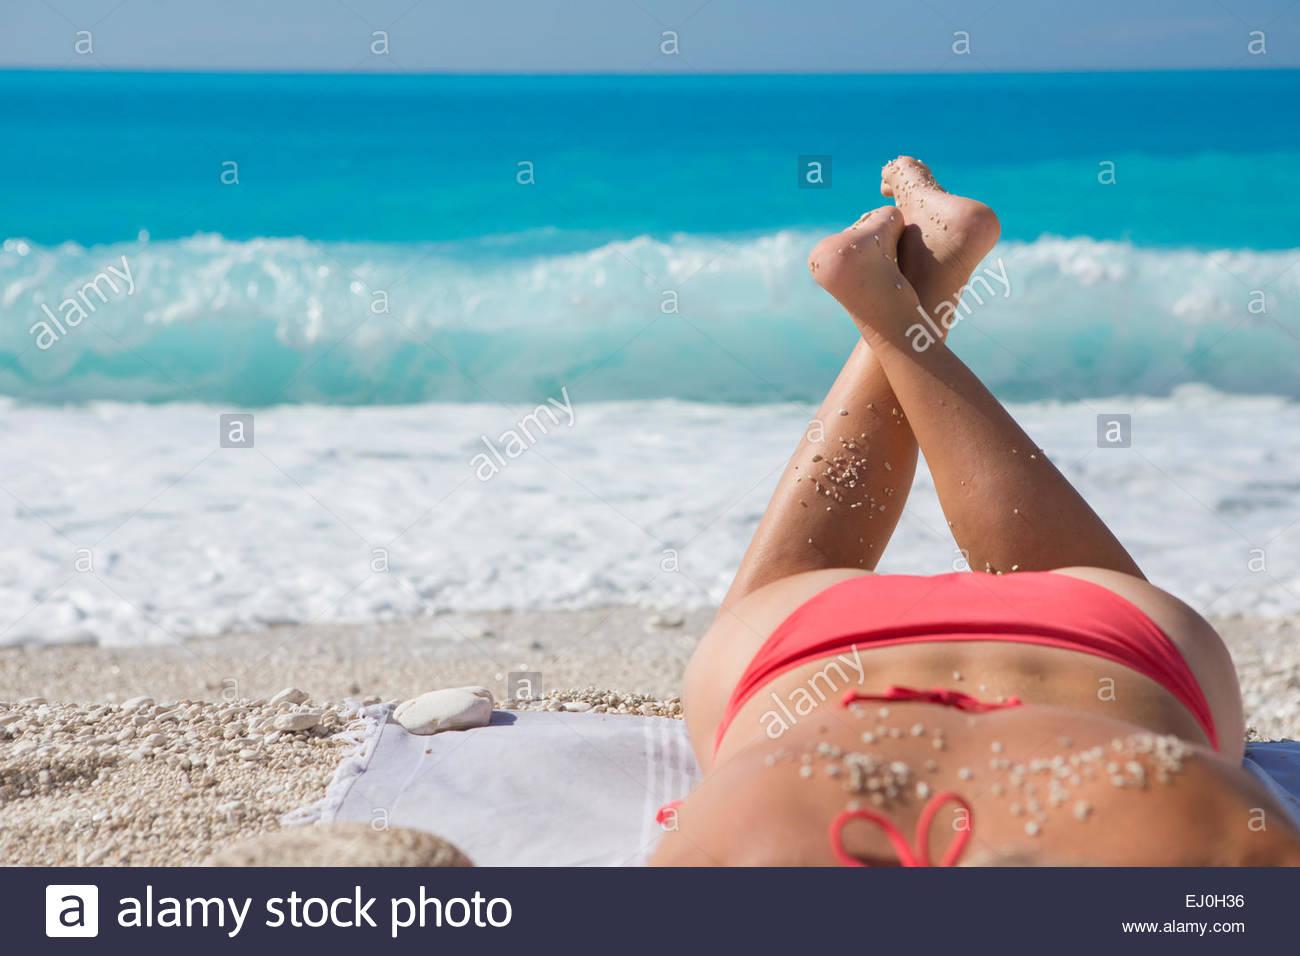 woman, sunbathing with sand on back, on sunny beach - Stock Image